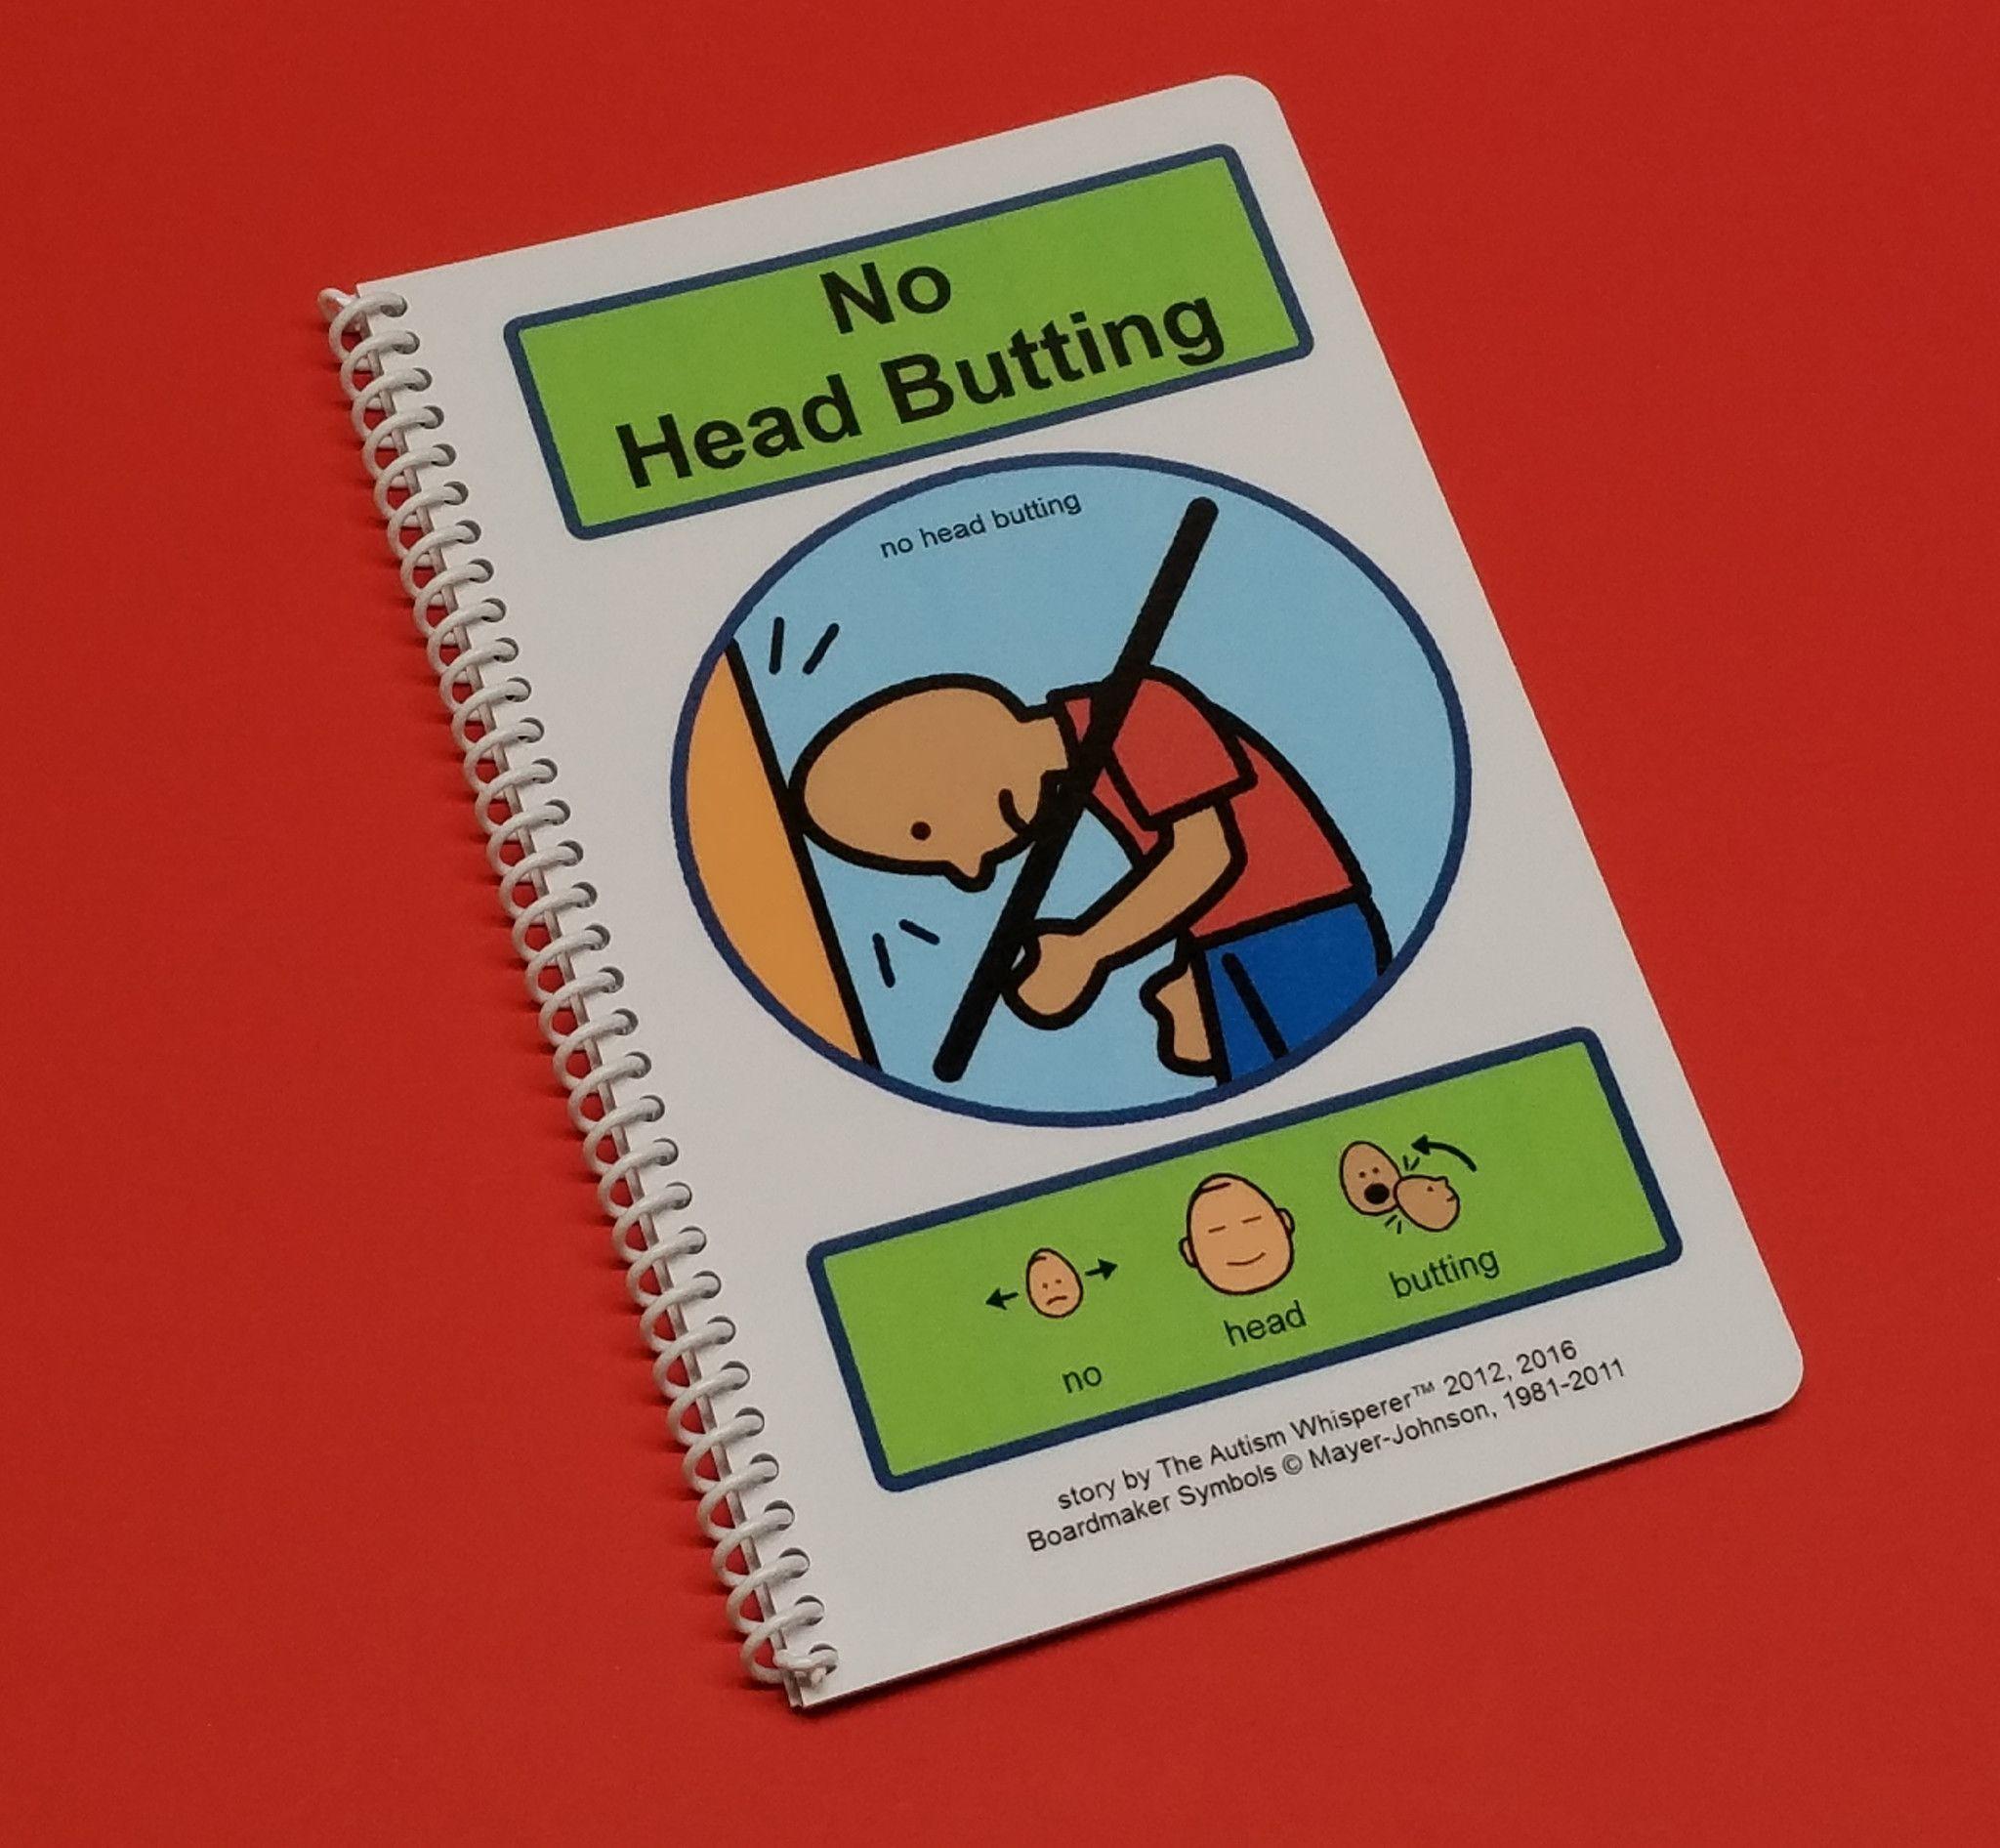 No Head Butting